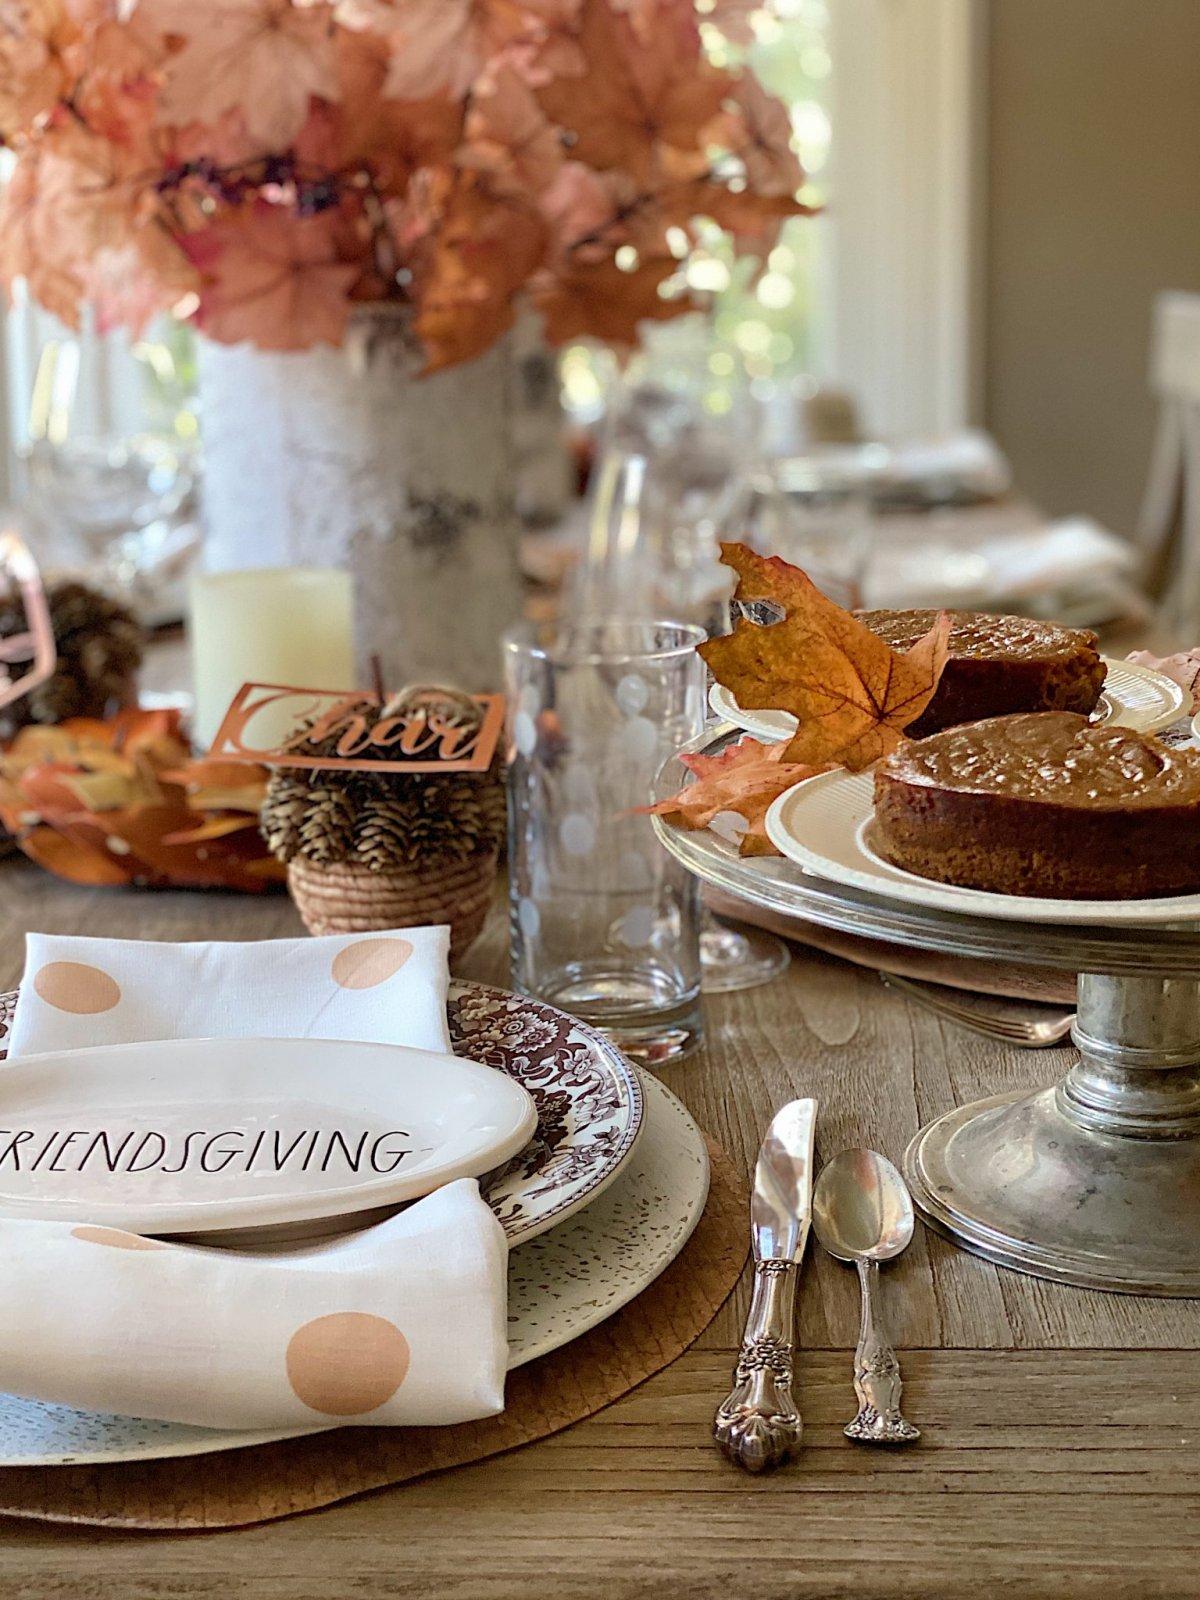 Friendsgiving Table Setting